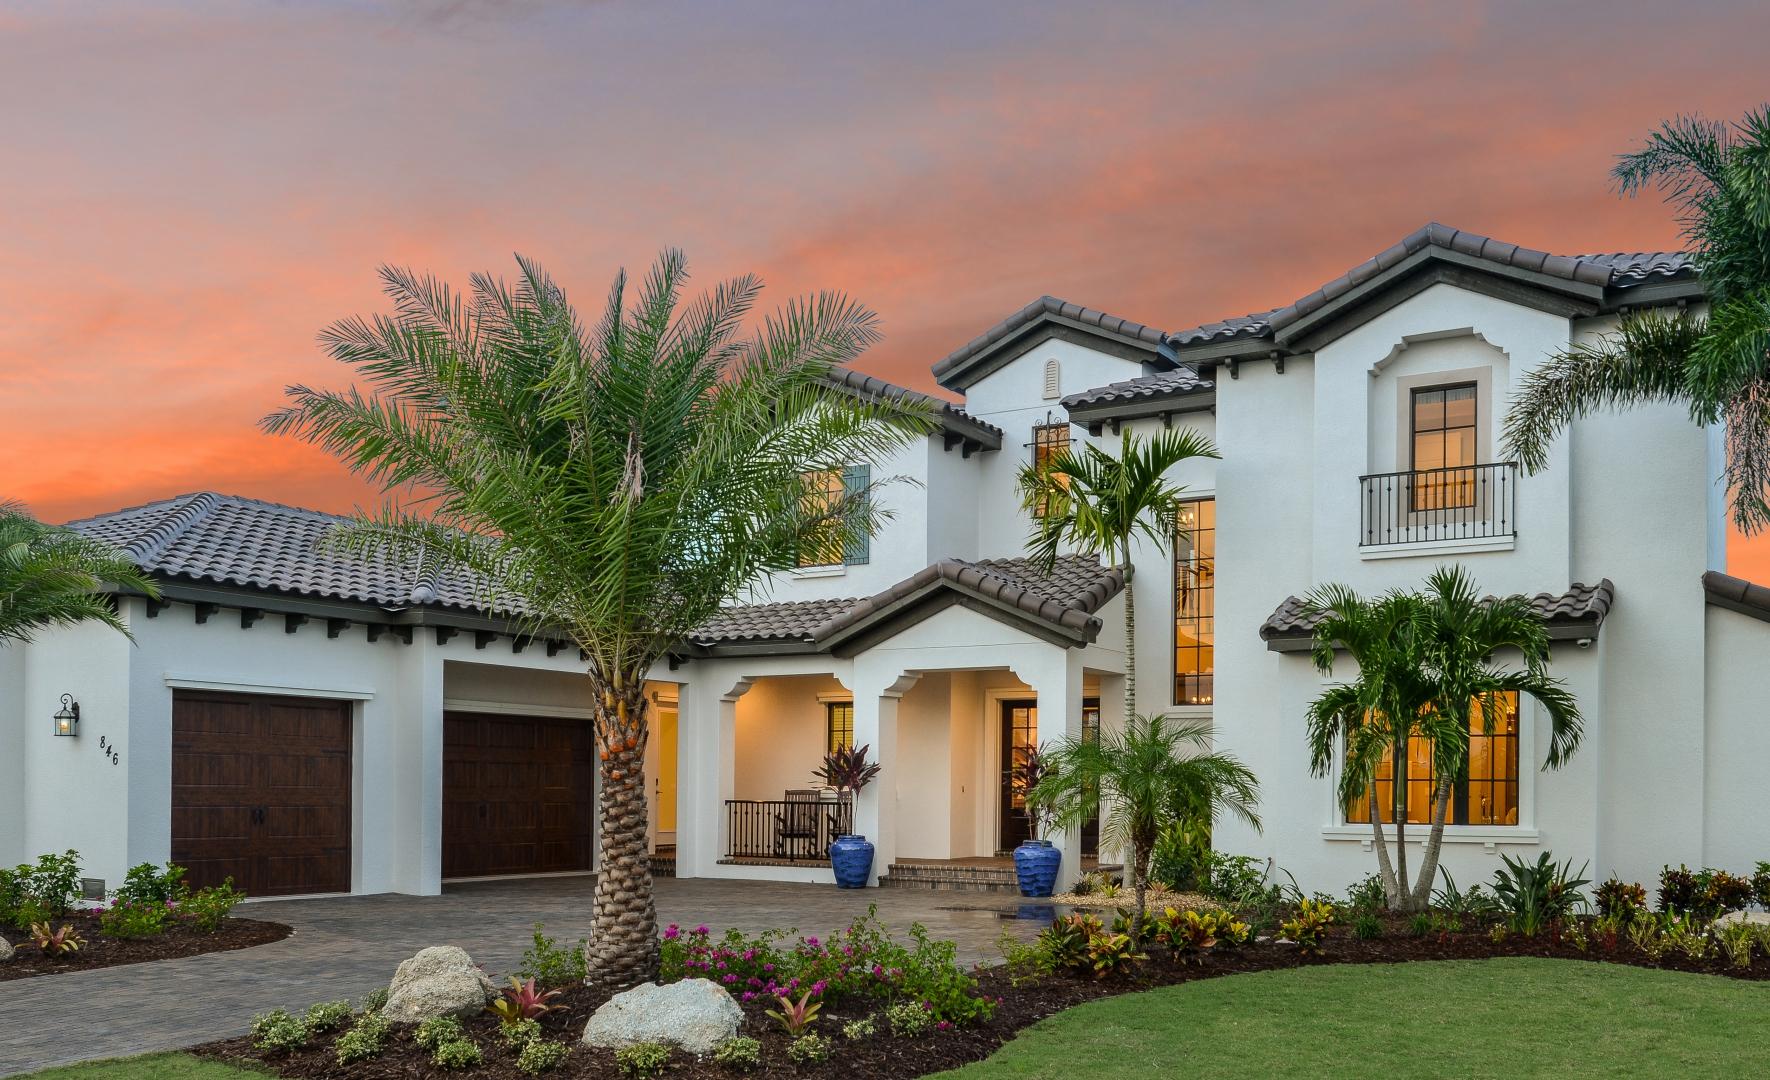 The Mindera Model by John Cannon Homes HD Mira Bay Apollo Beach Florida Real Estate | Apollo Beach Realtor | New Homes for Sale | Apollo Beach Florida